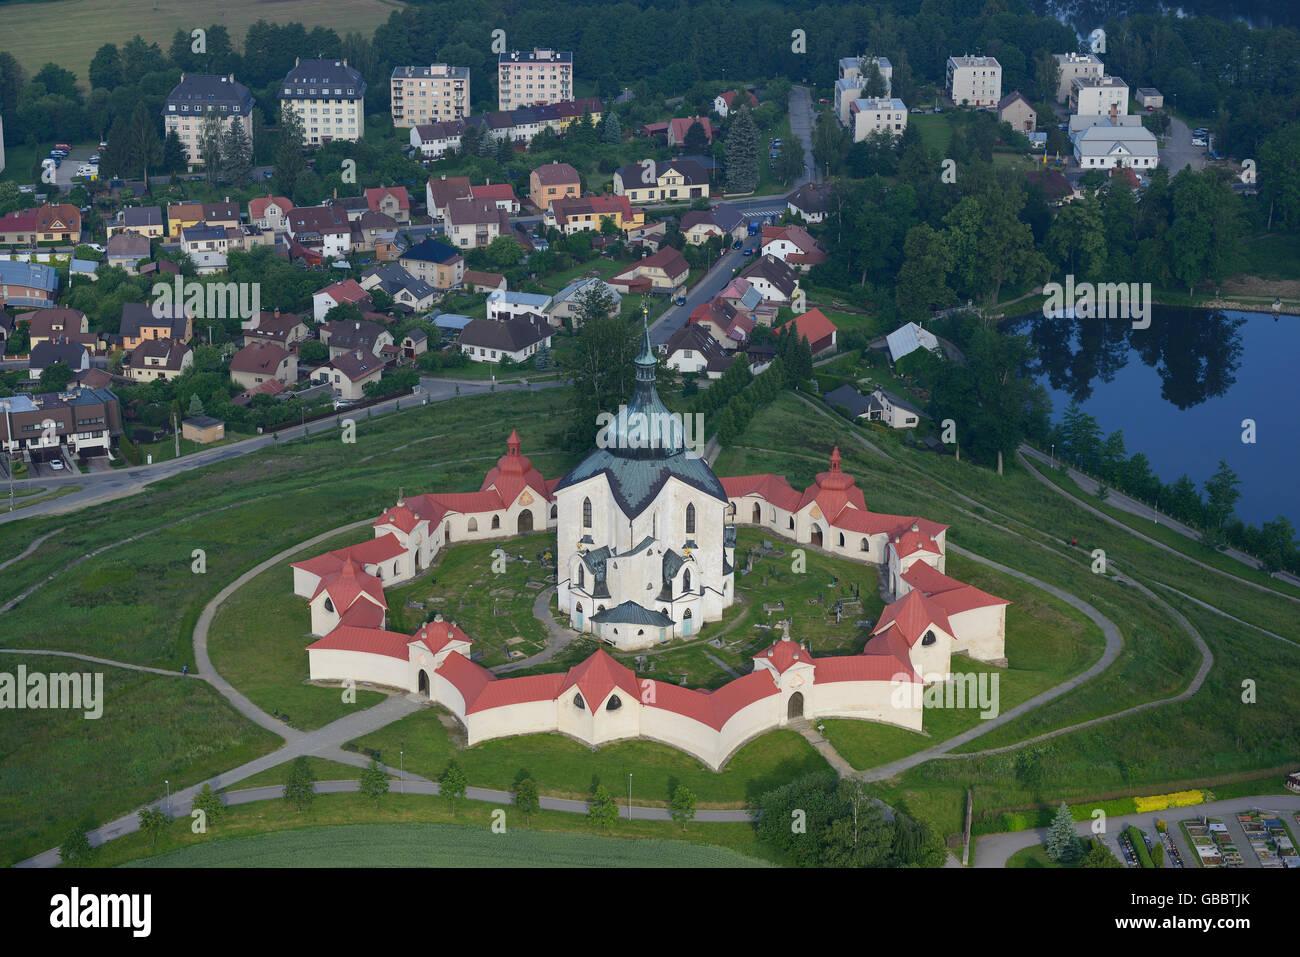 CHURCH OF SAINT JOHN OF NEPOMUK (aerial view). At Zelena Hora near the town of Zdar nad Sazavou, Czech Republic. - Stock Image